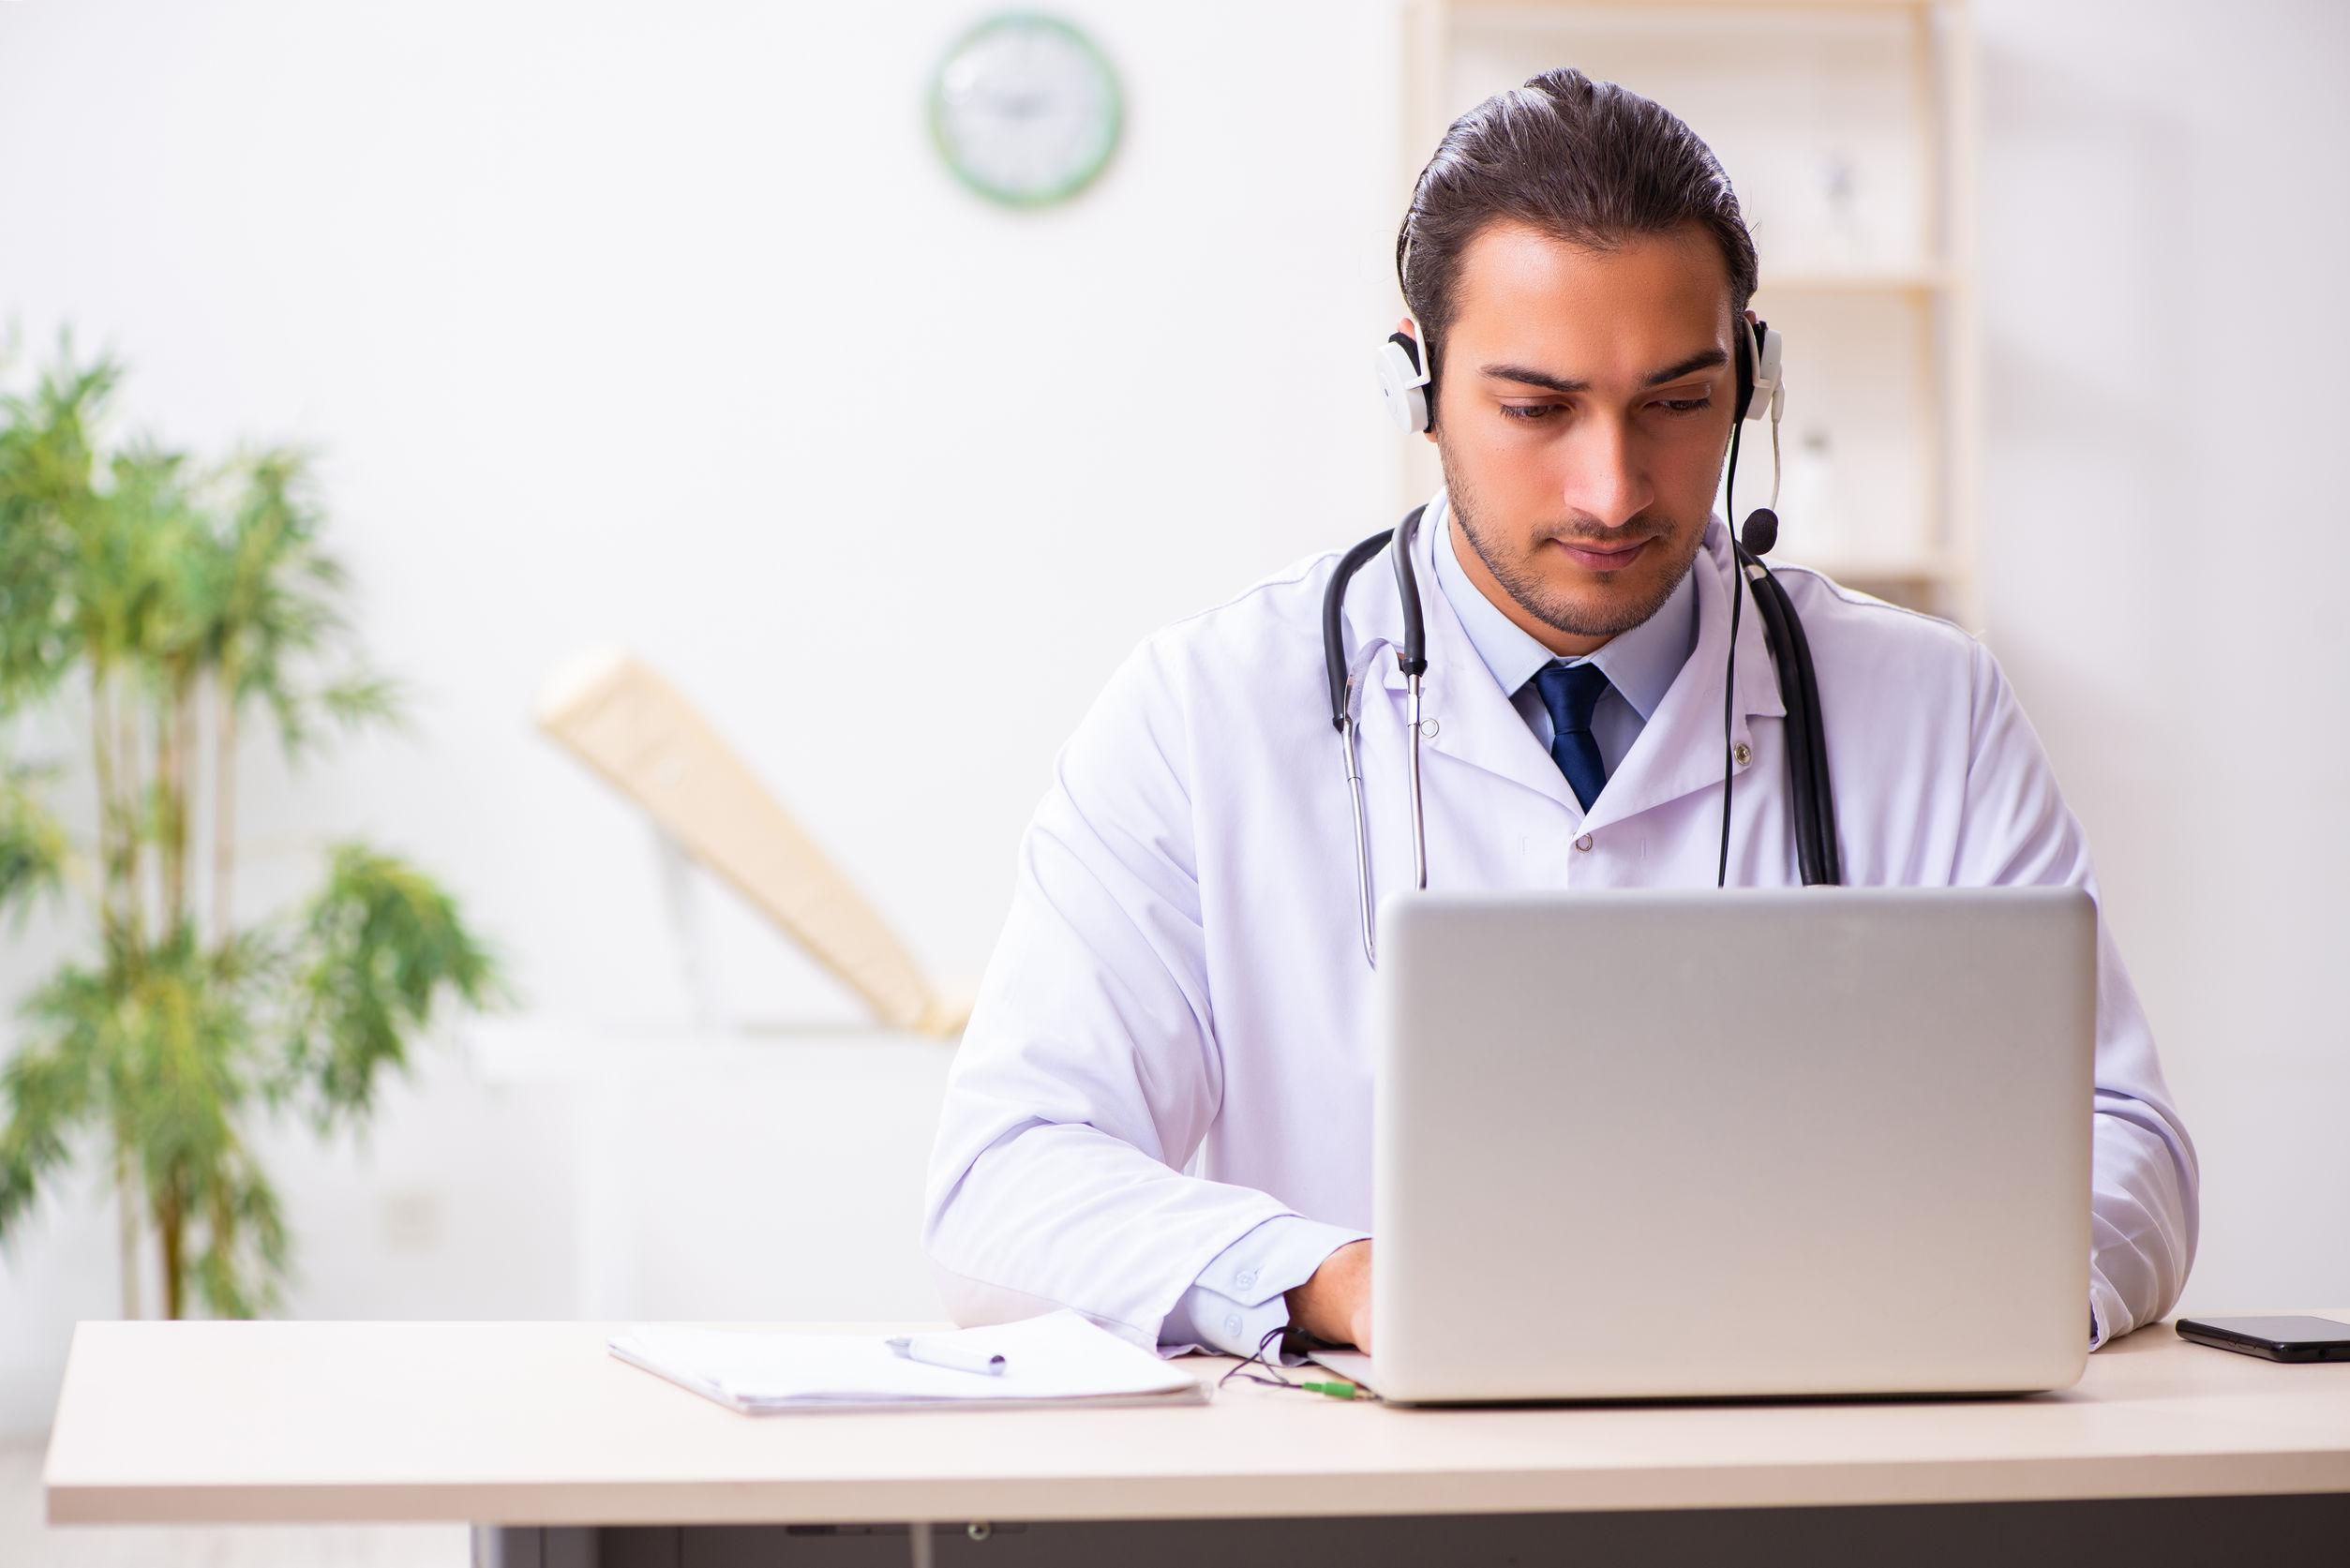 TeleHealth: Telephone & Vxirtual Sessions During Coronavirus Pandemic